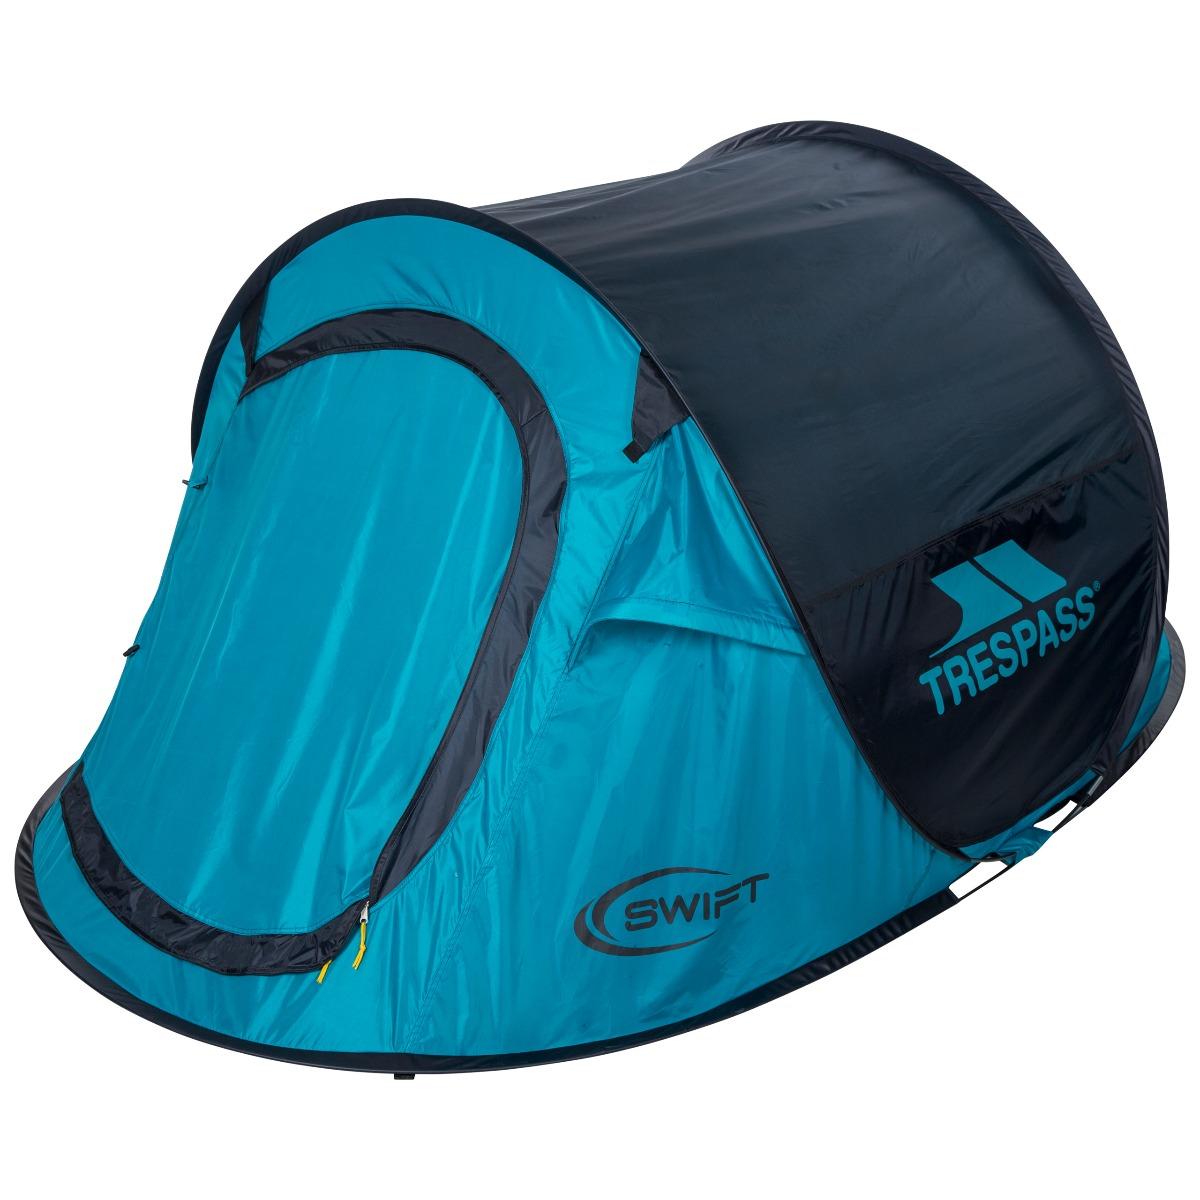 Trespass Camping Tent Waterproof 2 Man Pop Up Hiking Festival Fishing Swift2